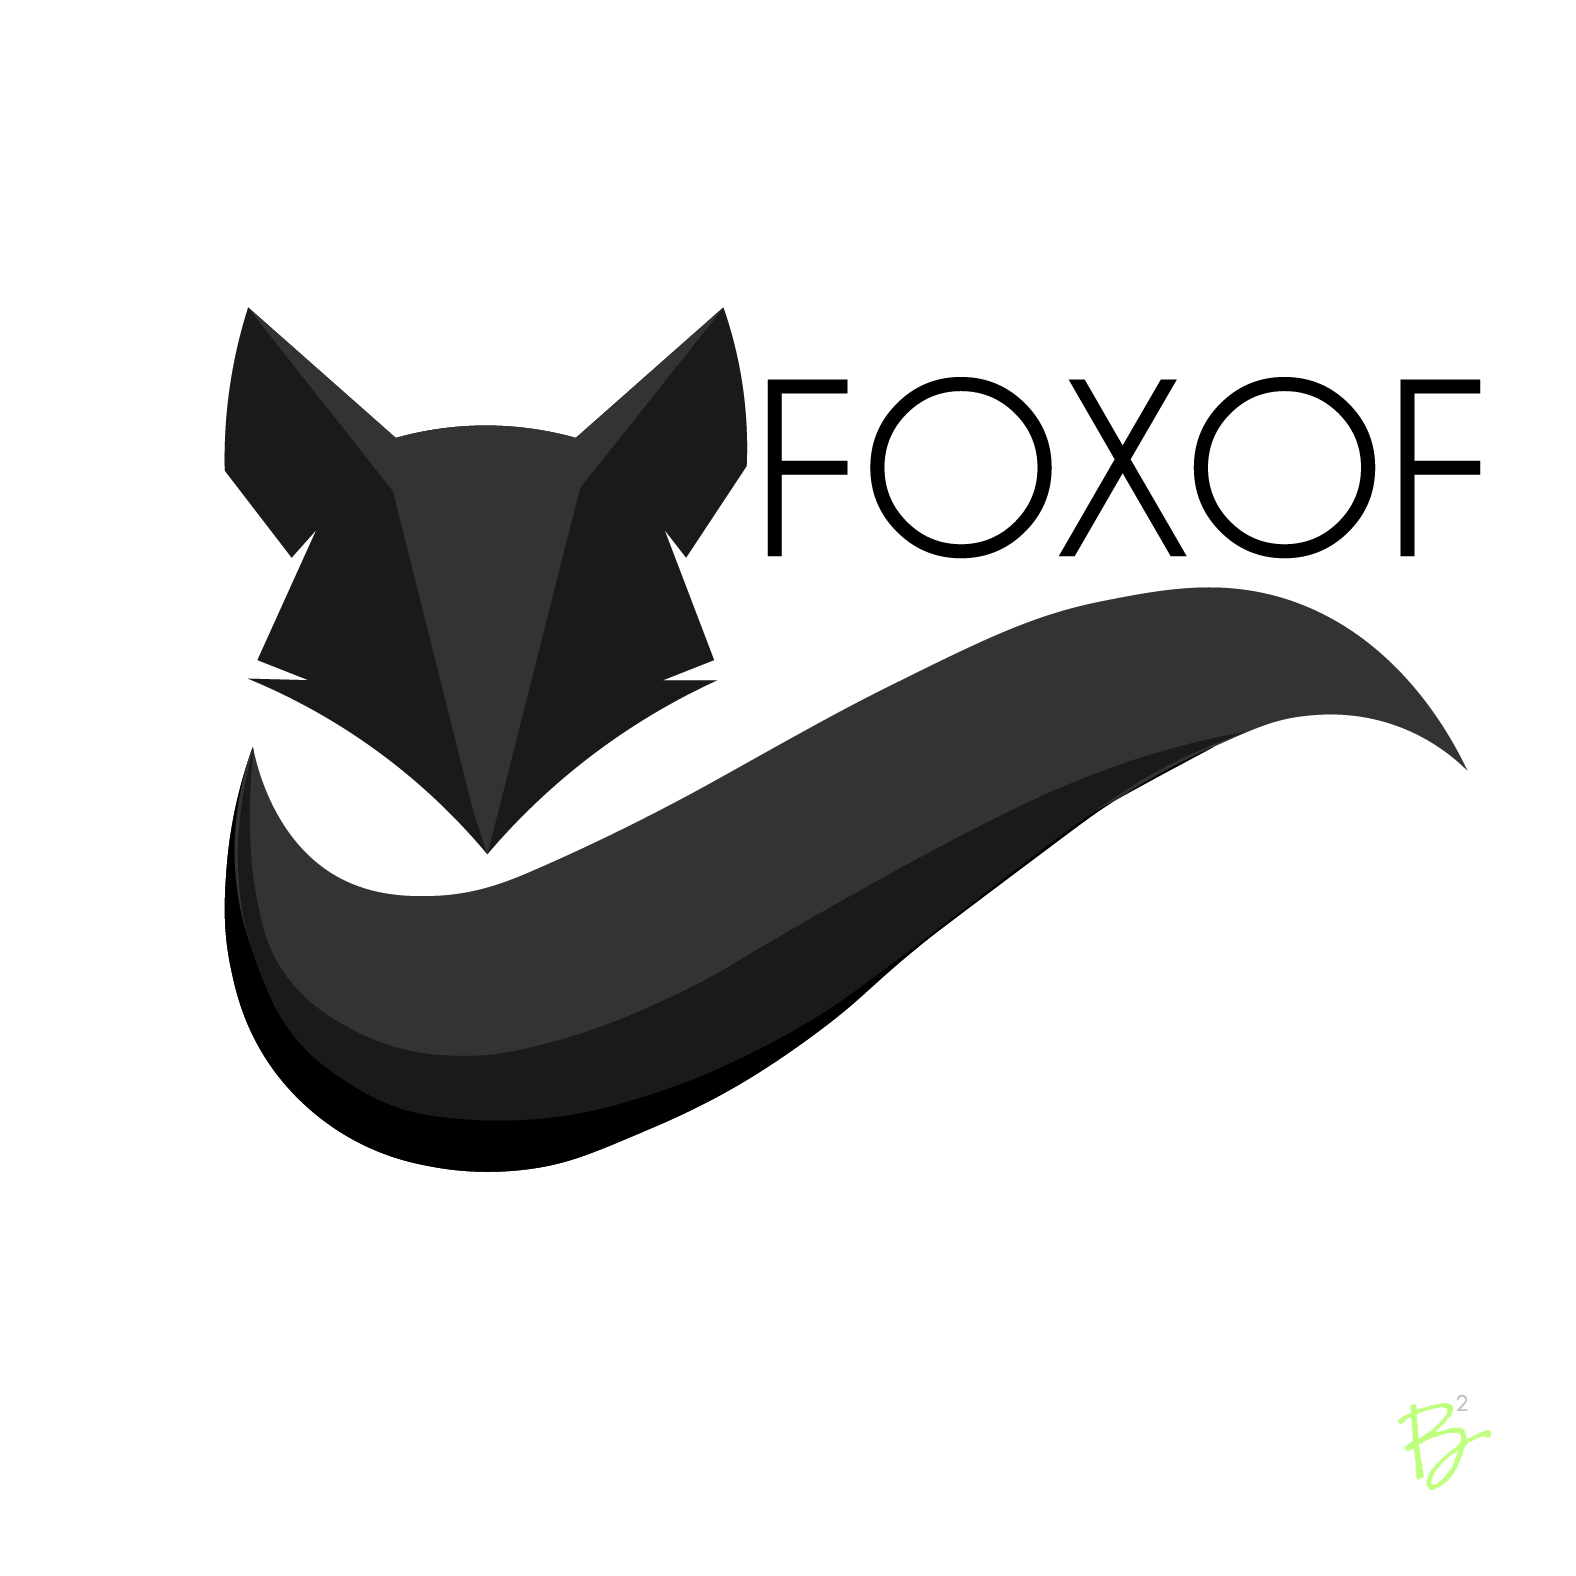 50 Day Logo_Fox.jpg